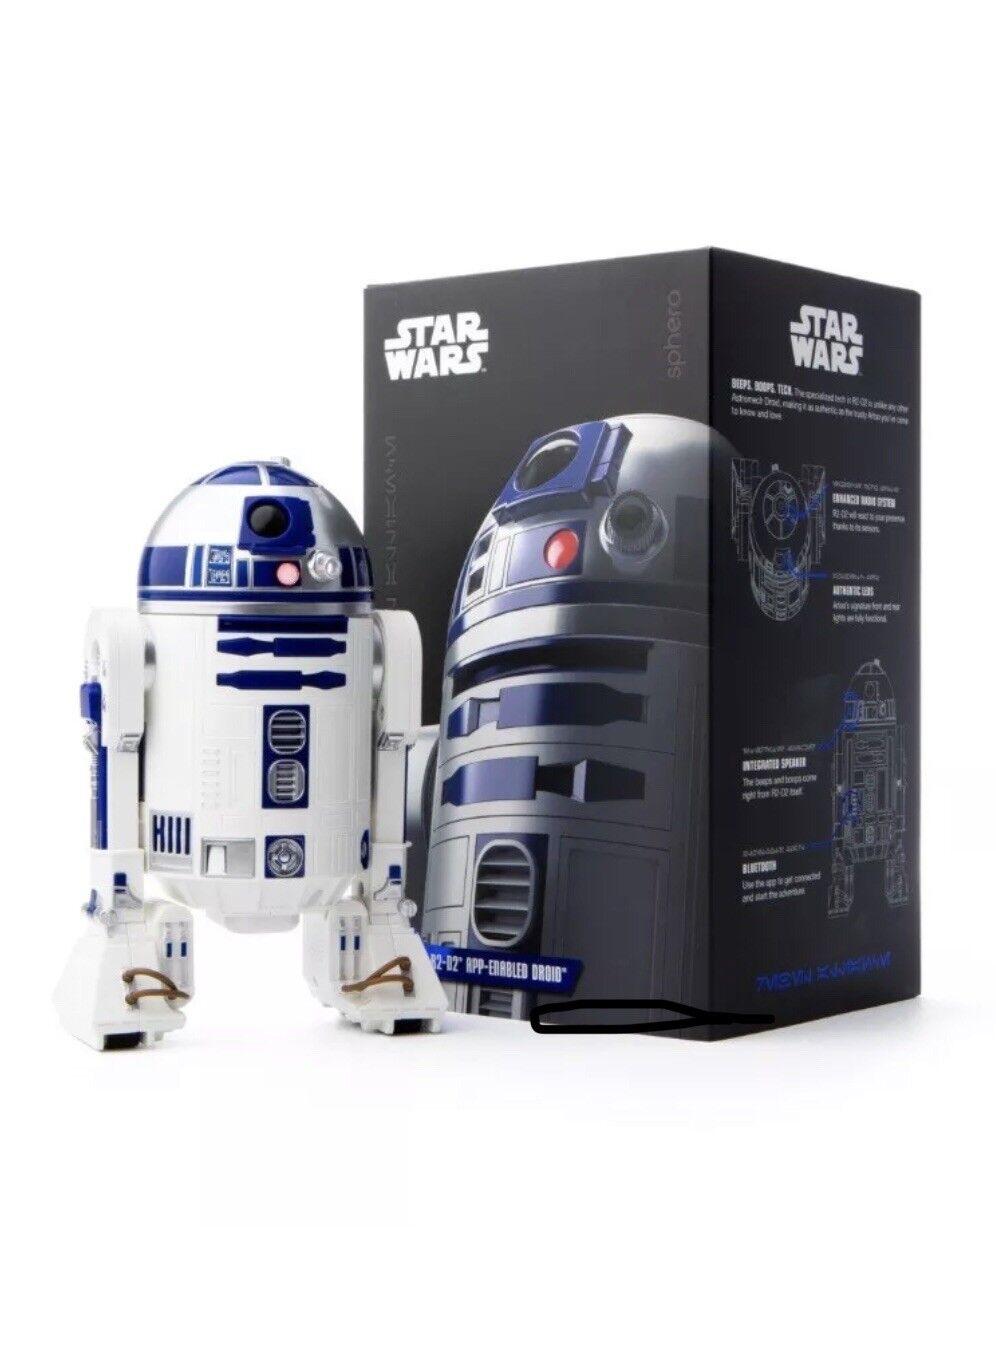 Sphero Star Wars Wars Wars R2-D2 App-Enabled Droid - Brand New Sealed c508dd